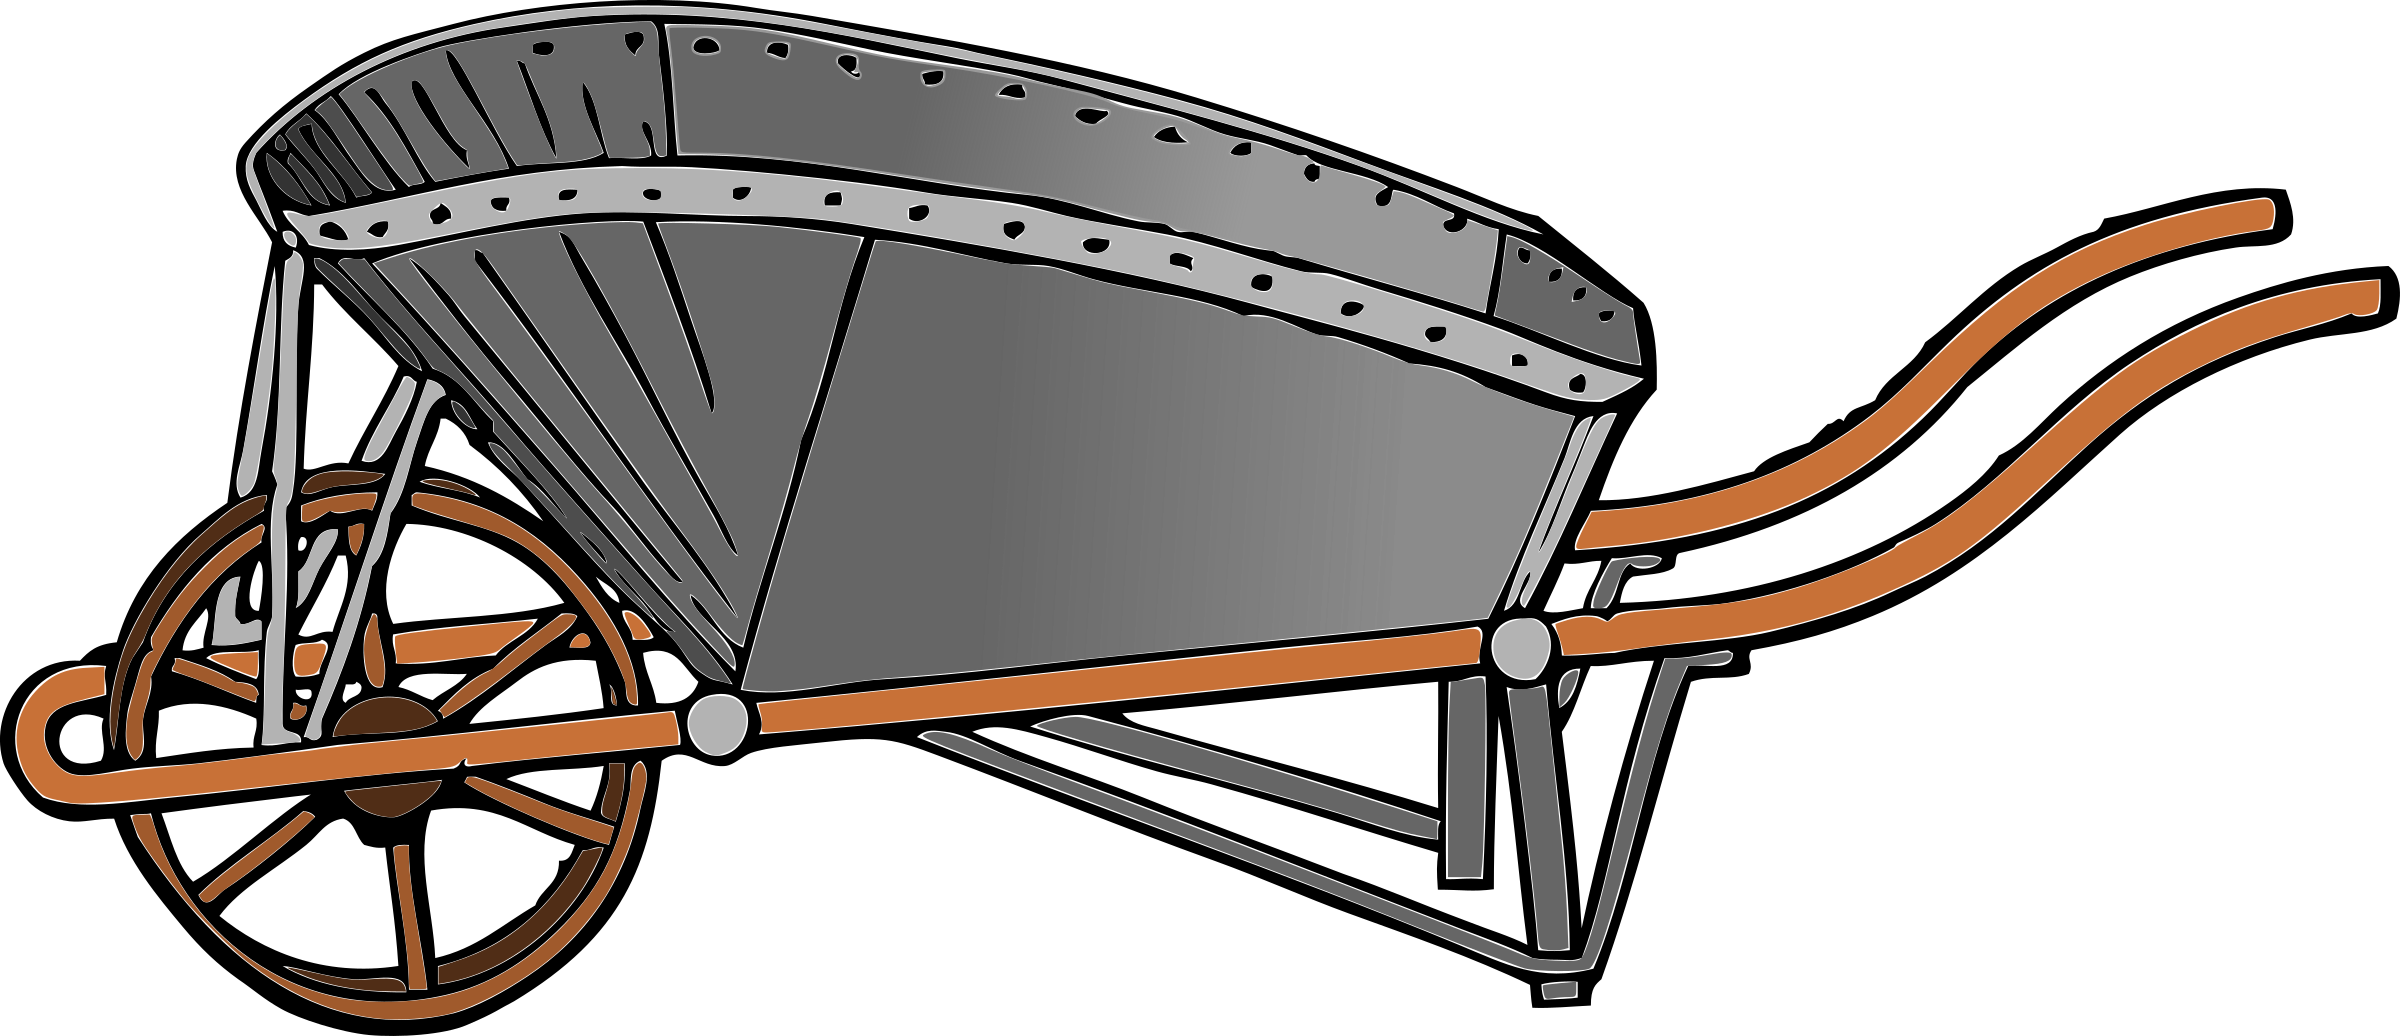 Coal barrow color big. Wagon clipart oxcart